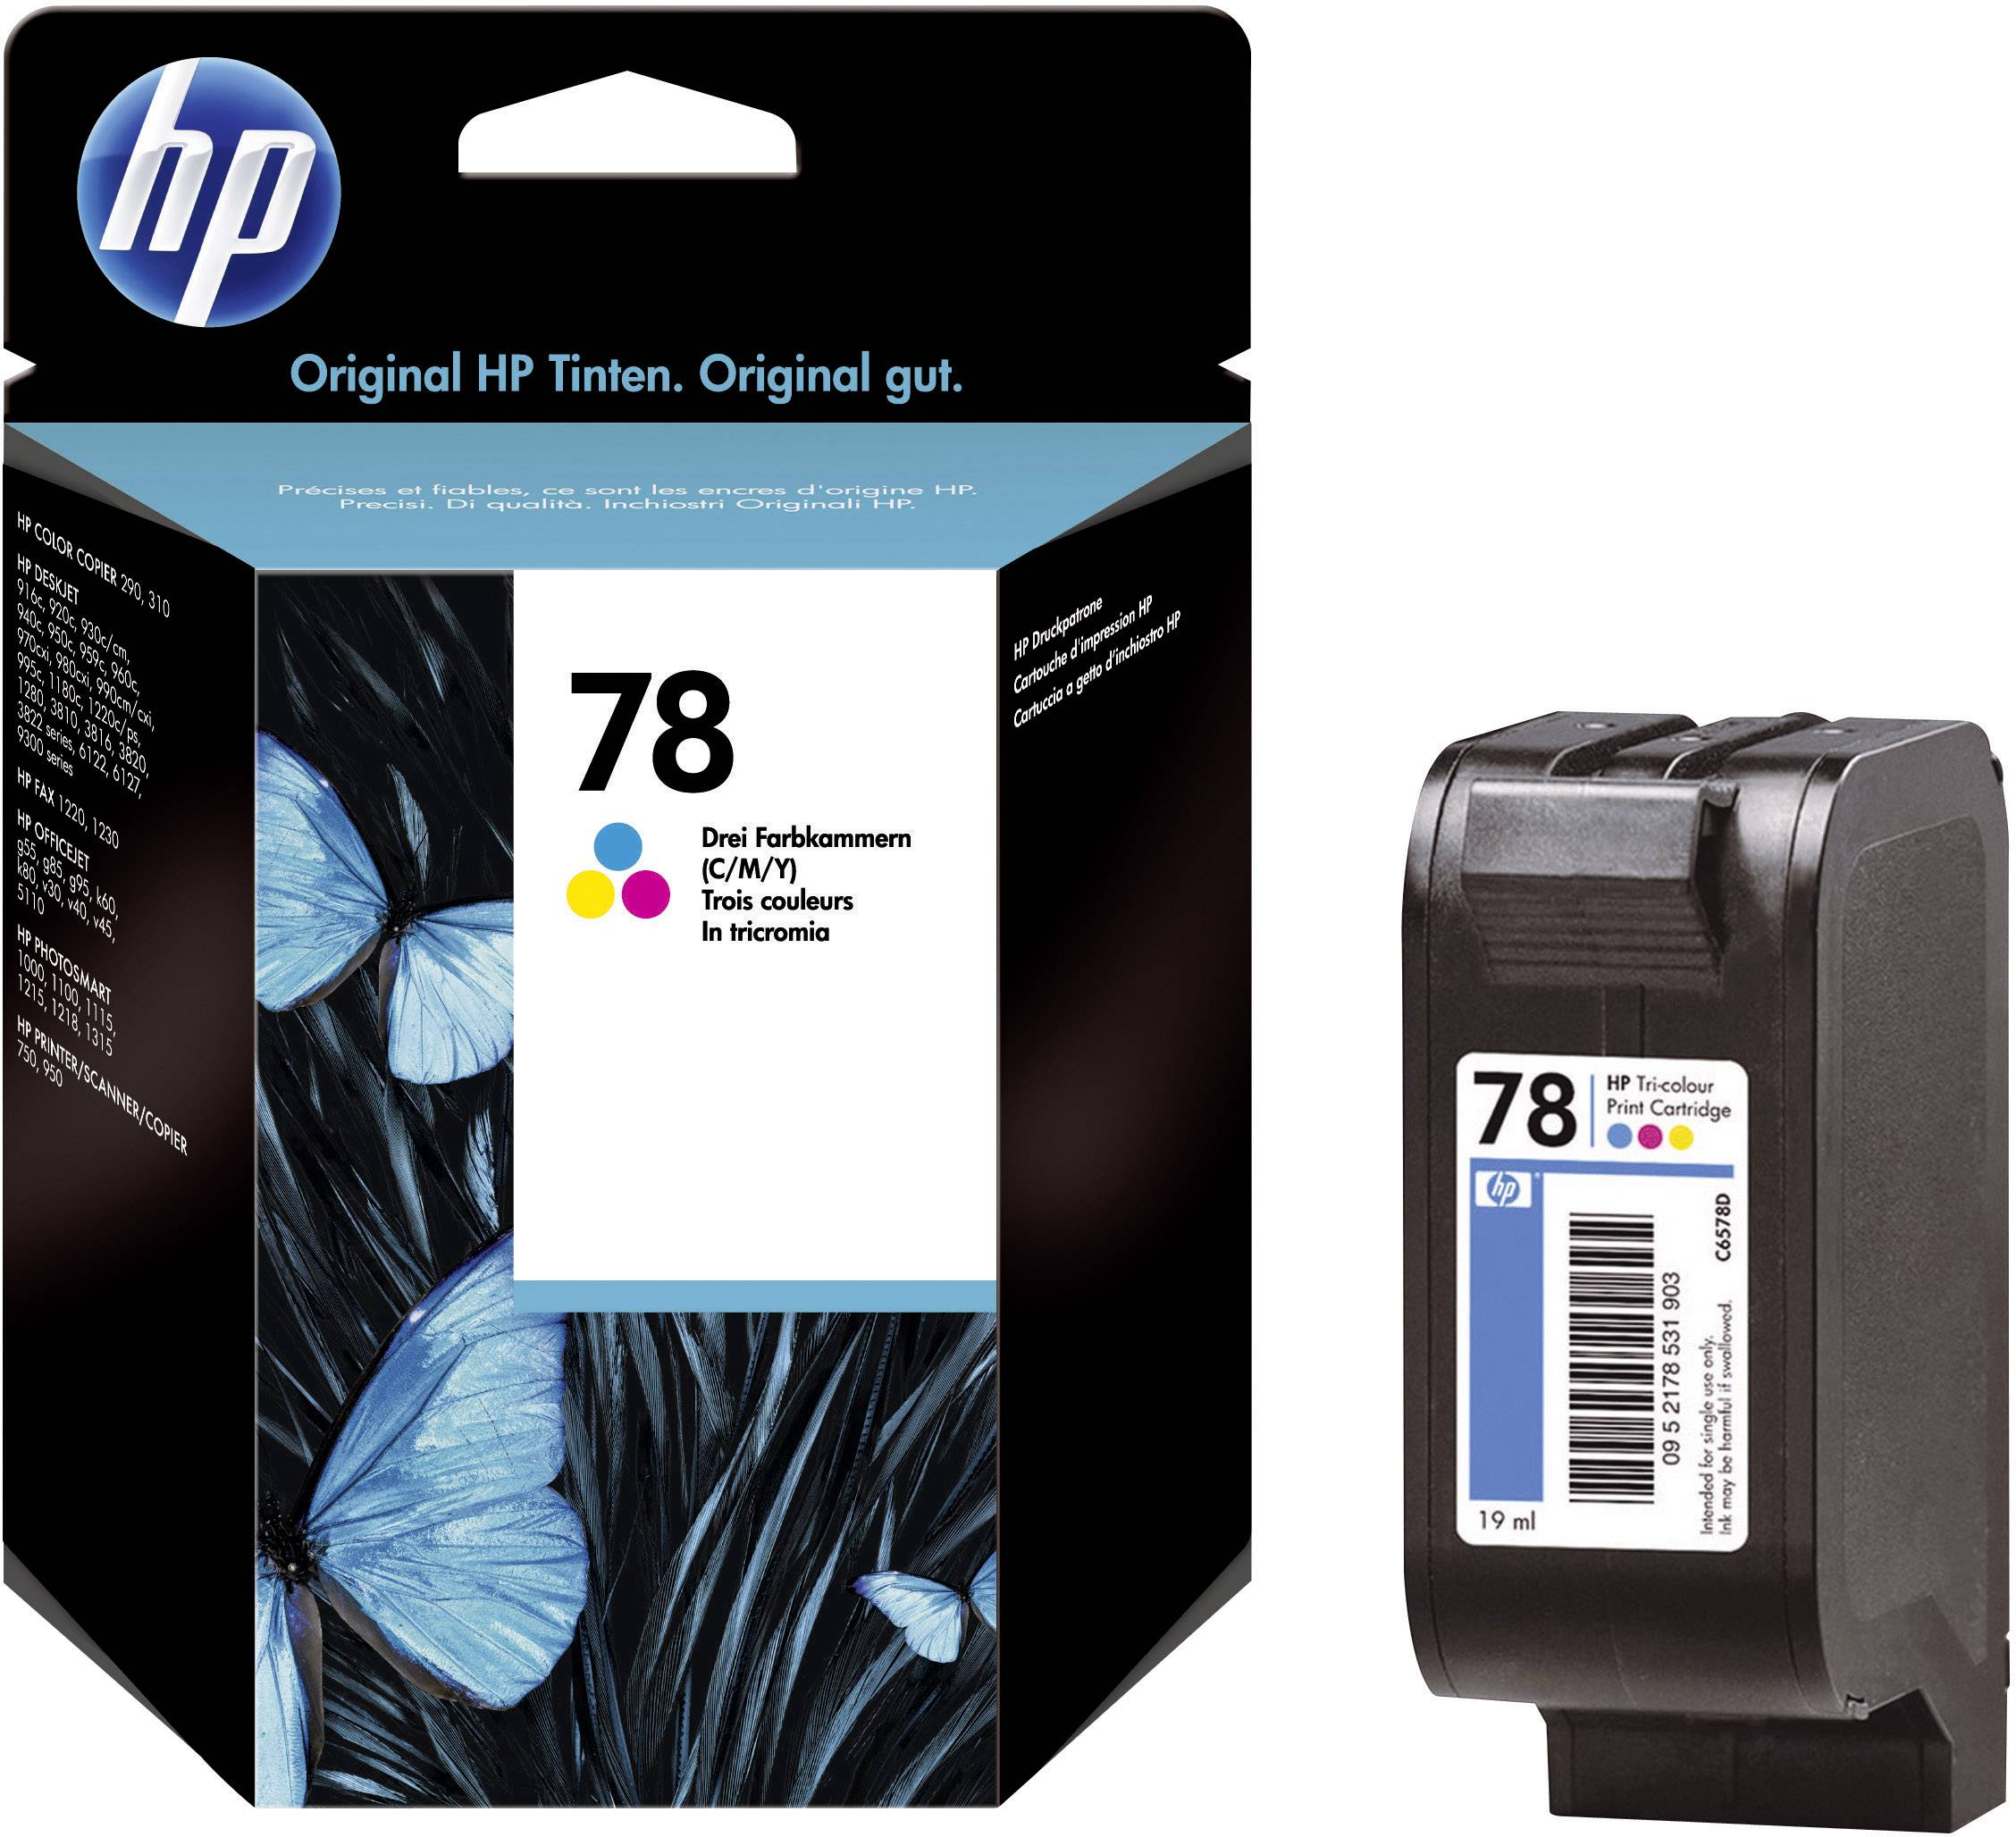 Toner do tiskárny HP C6578D (78) barevná